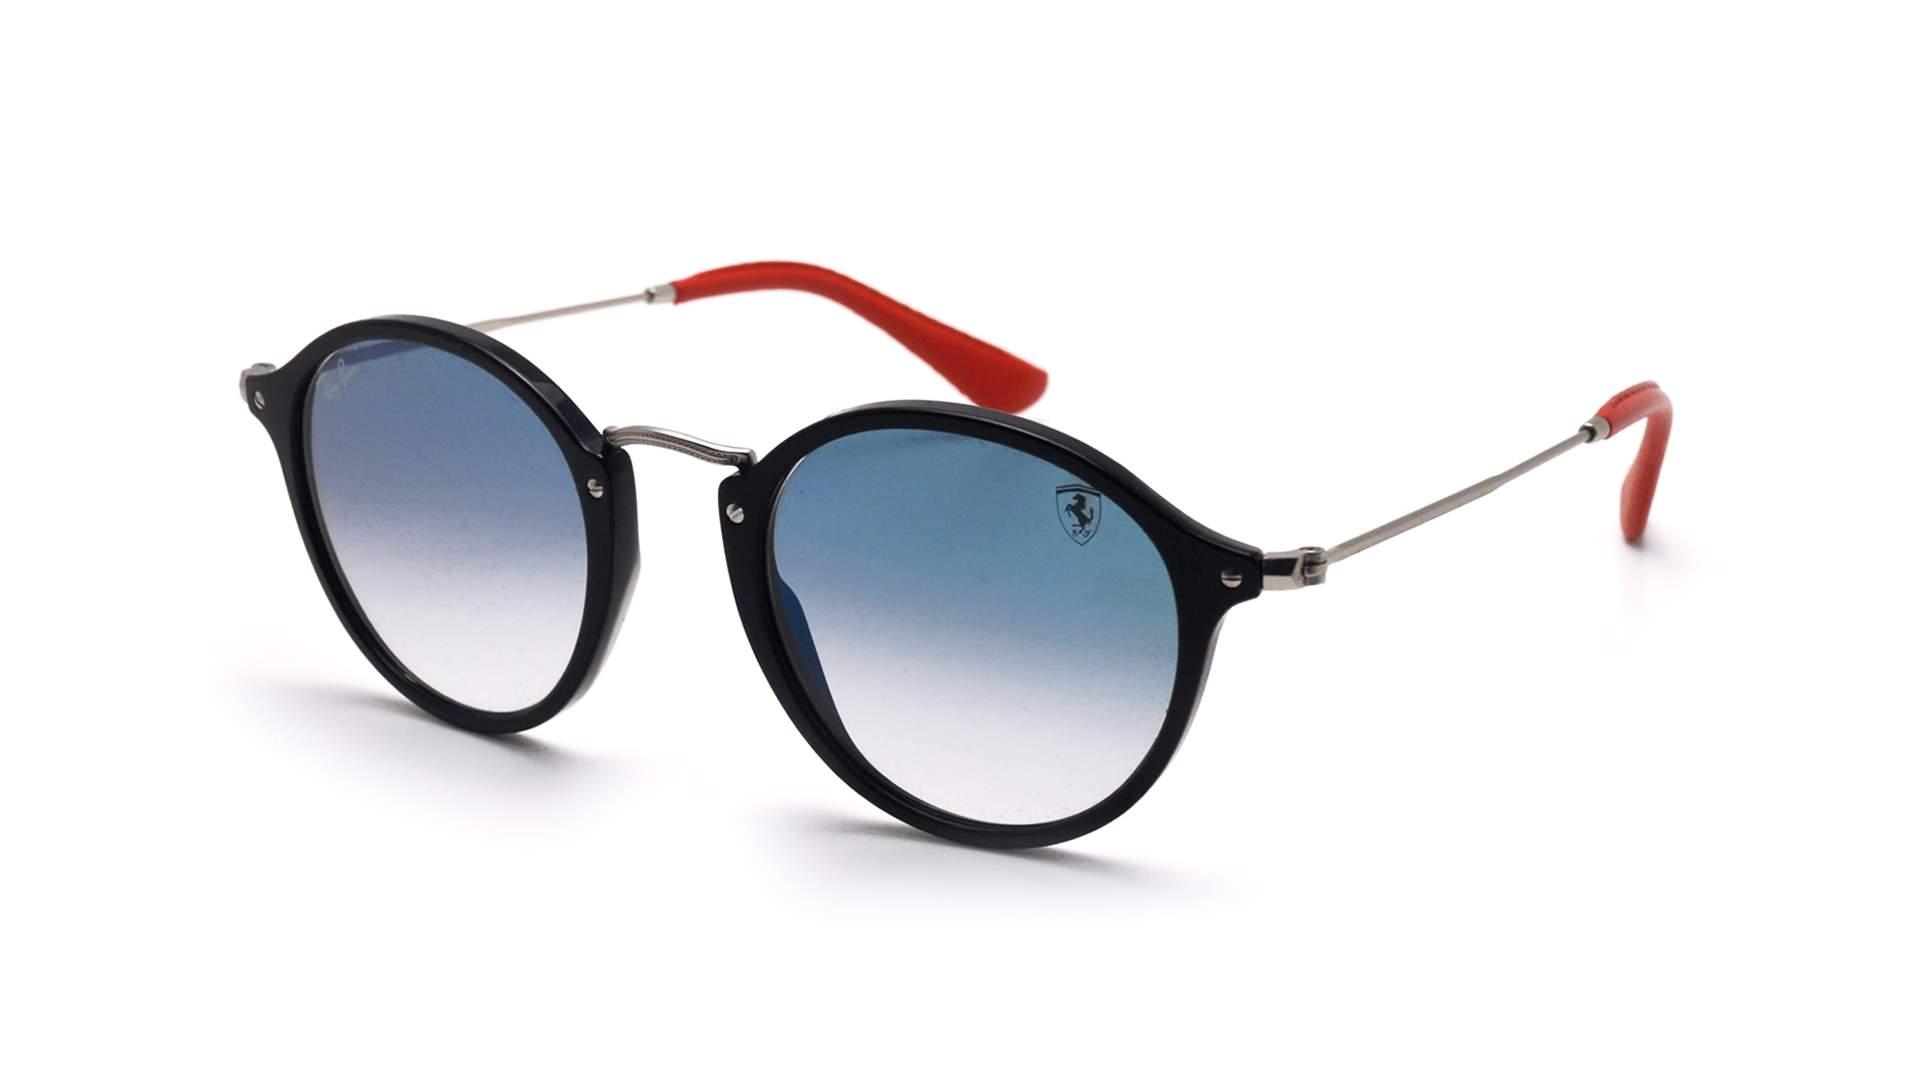 26a1194543 Sunglasses Ray-Ban Round Scuderia Ferrari Black RB2447NM F601 3F 49-21  Medium Gradient